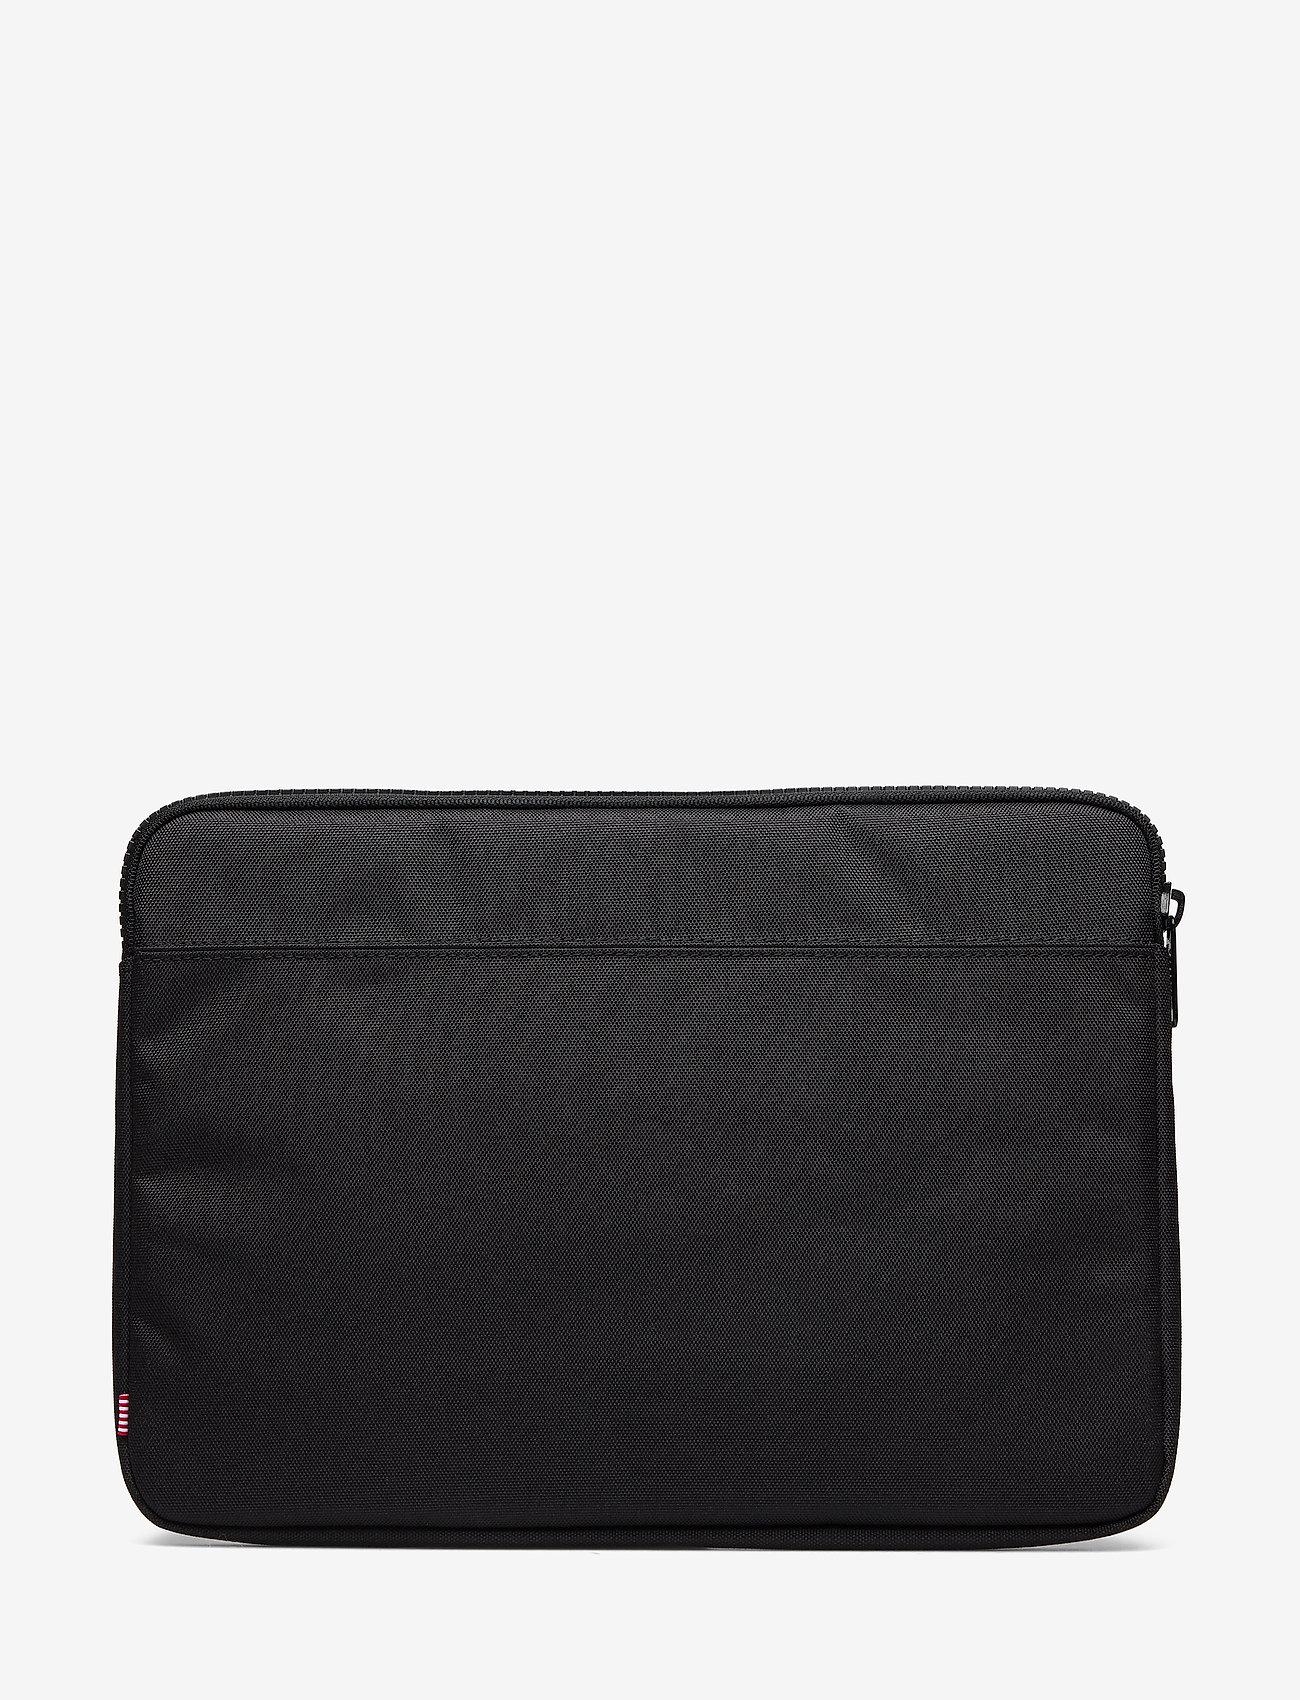 Herschel Anchor Sleeve for 13 inch Macbook - Torby komputerowe BLACK - Torby